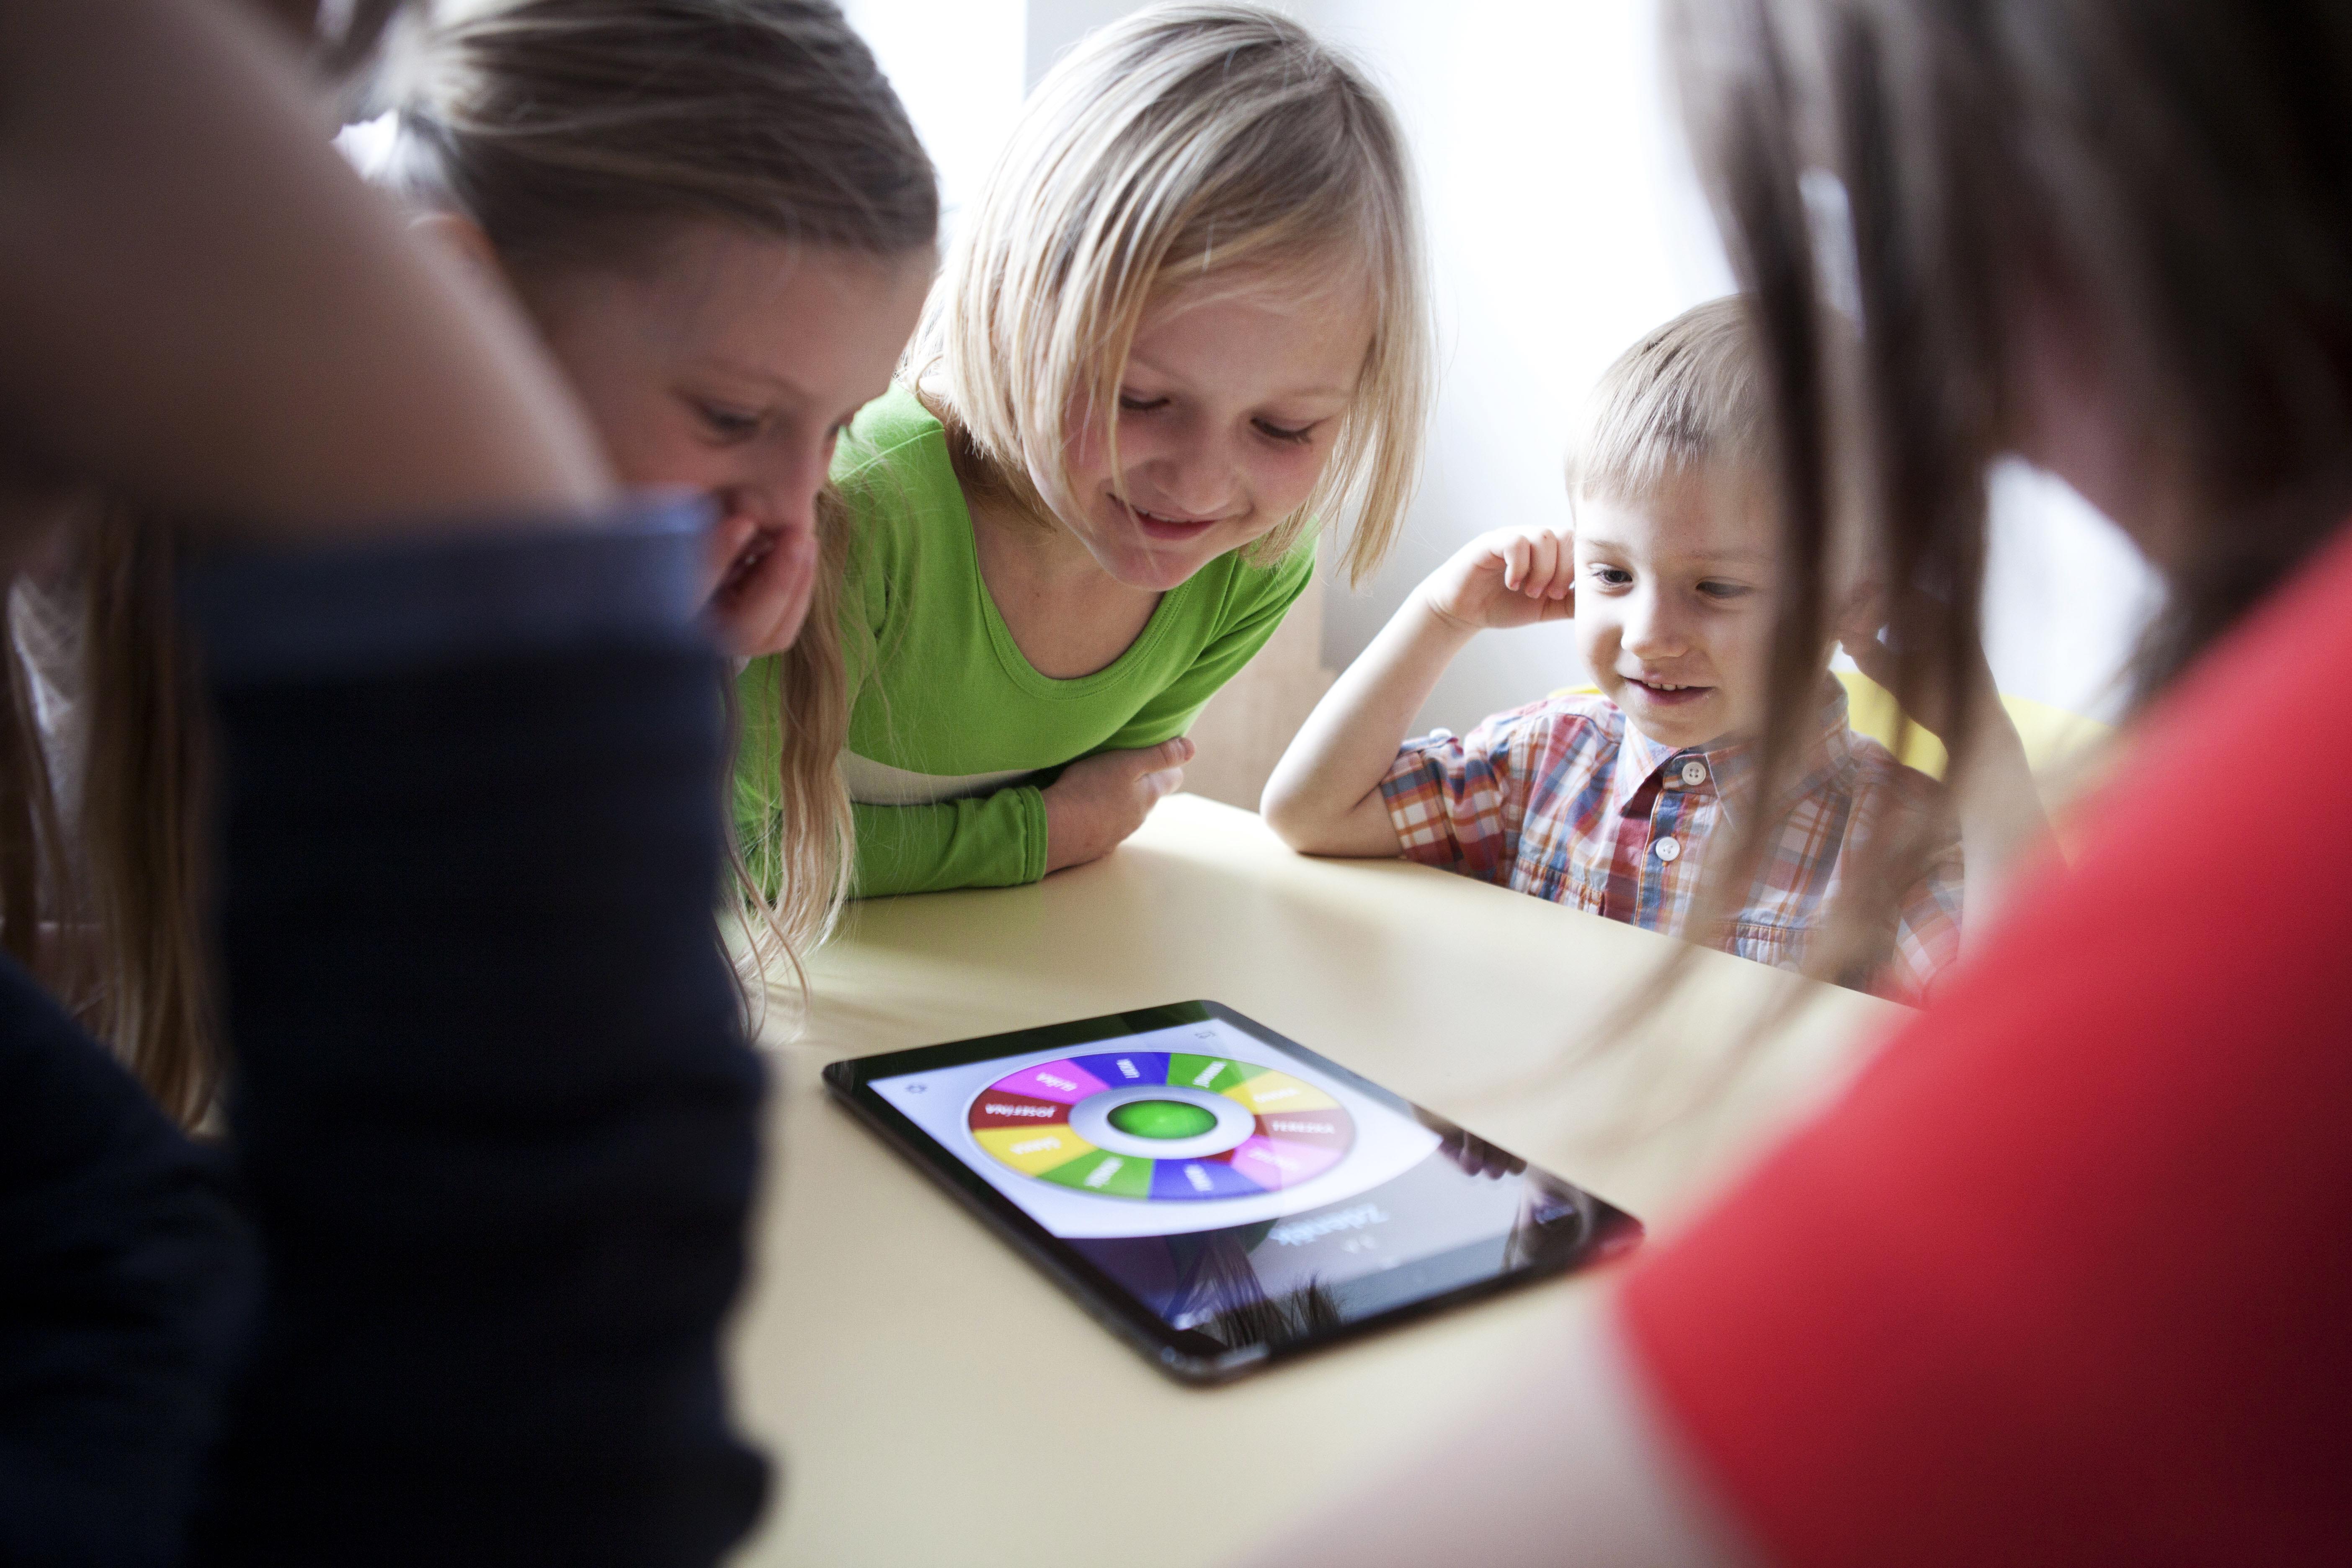 Kolo iPadagogiky